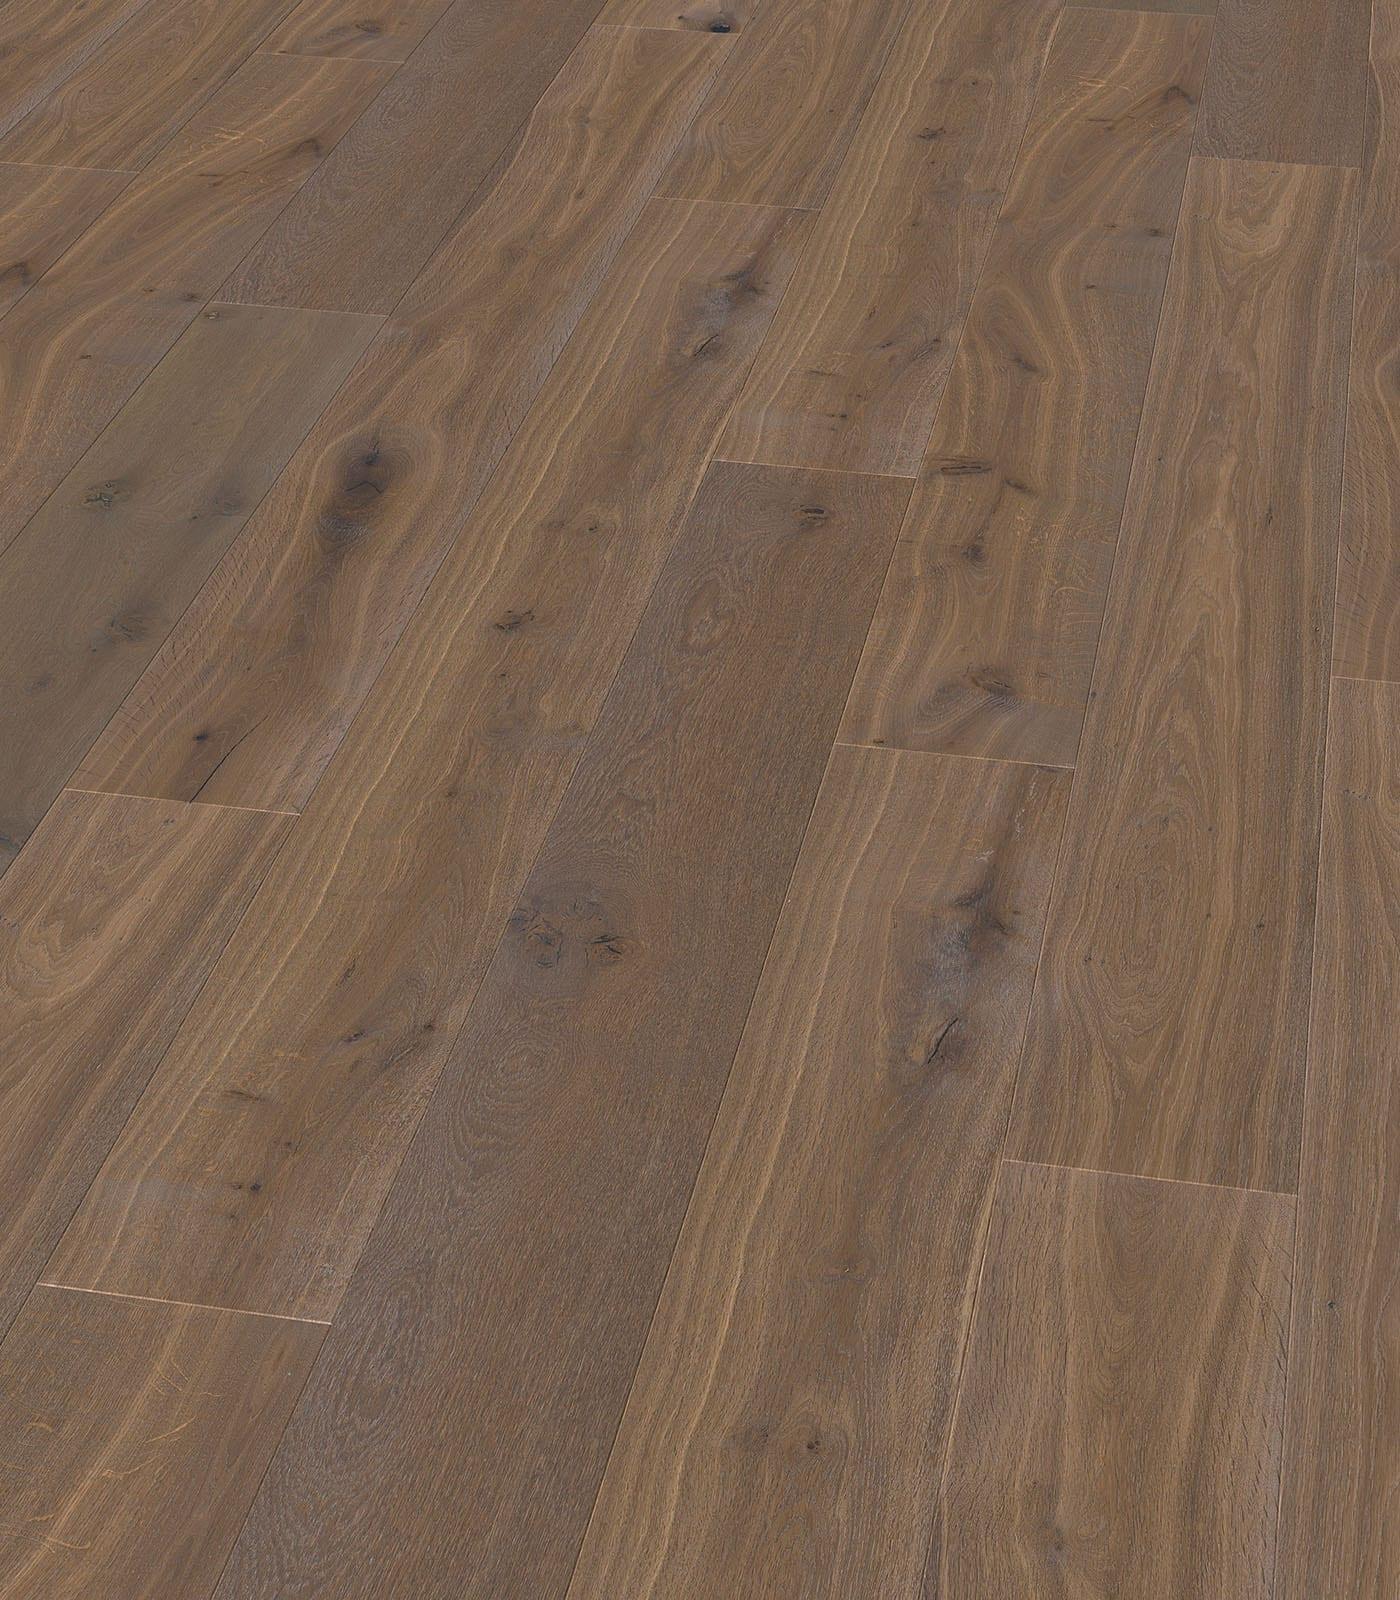 Biarritz-European Oak flooring-Lifestyle collection-angle